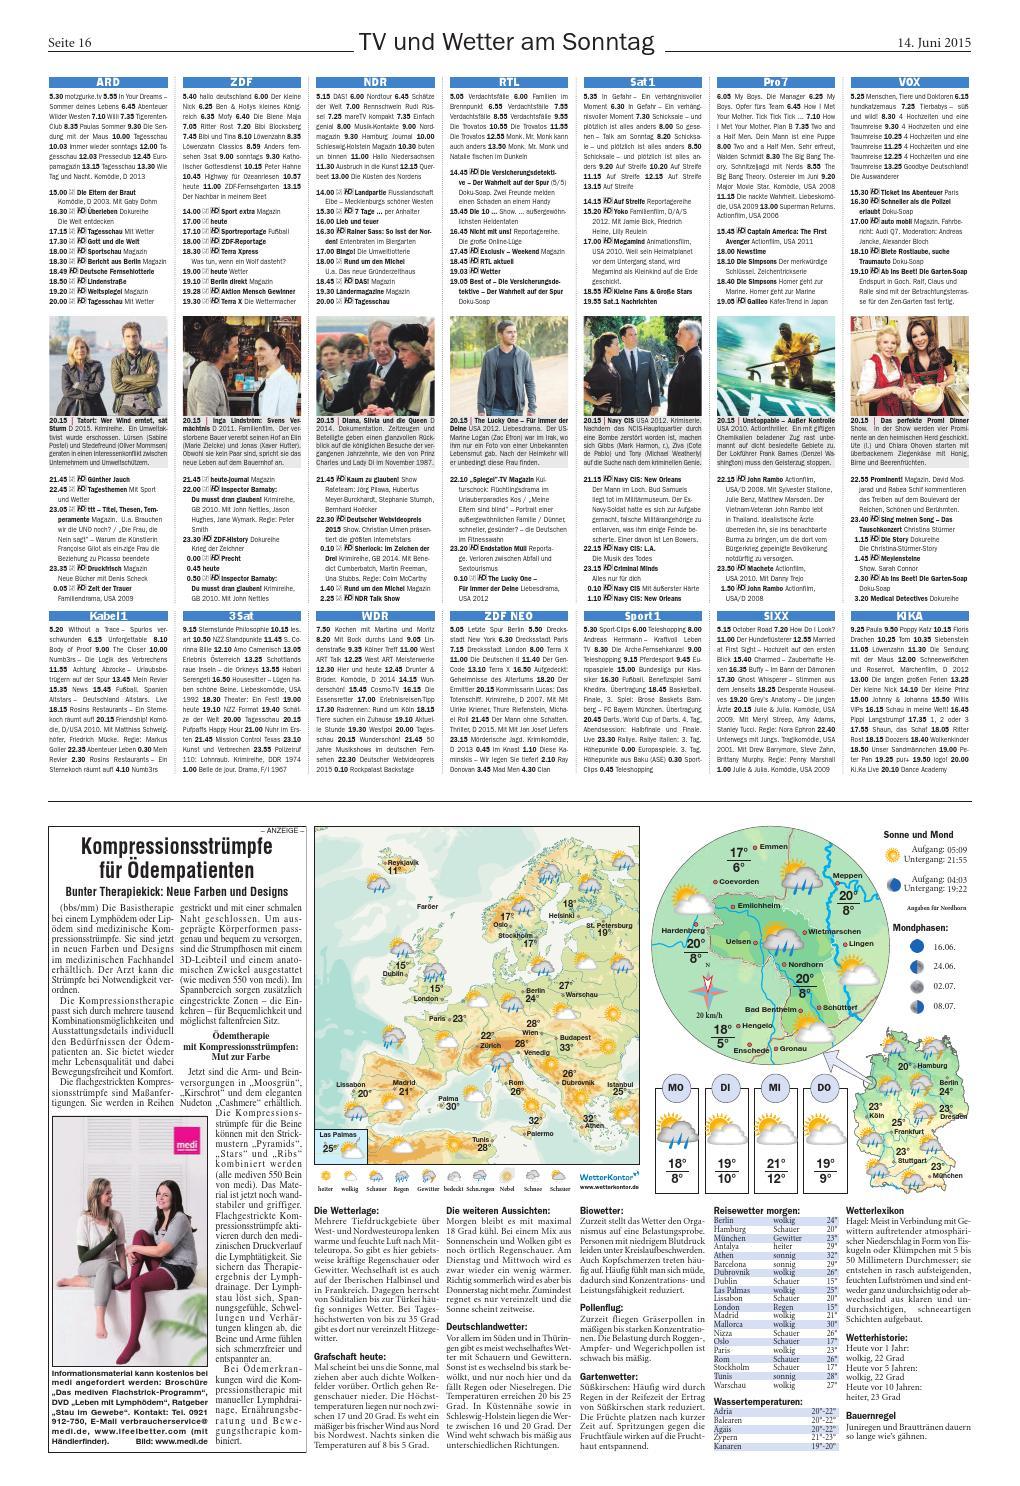 Gallery Sonntagszeitung 10.10.10 by SonntagsZeitung   issuu is free HD wallpaper.